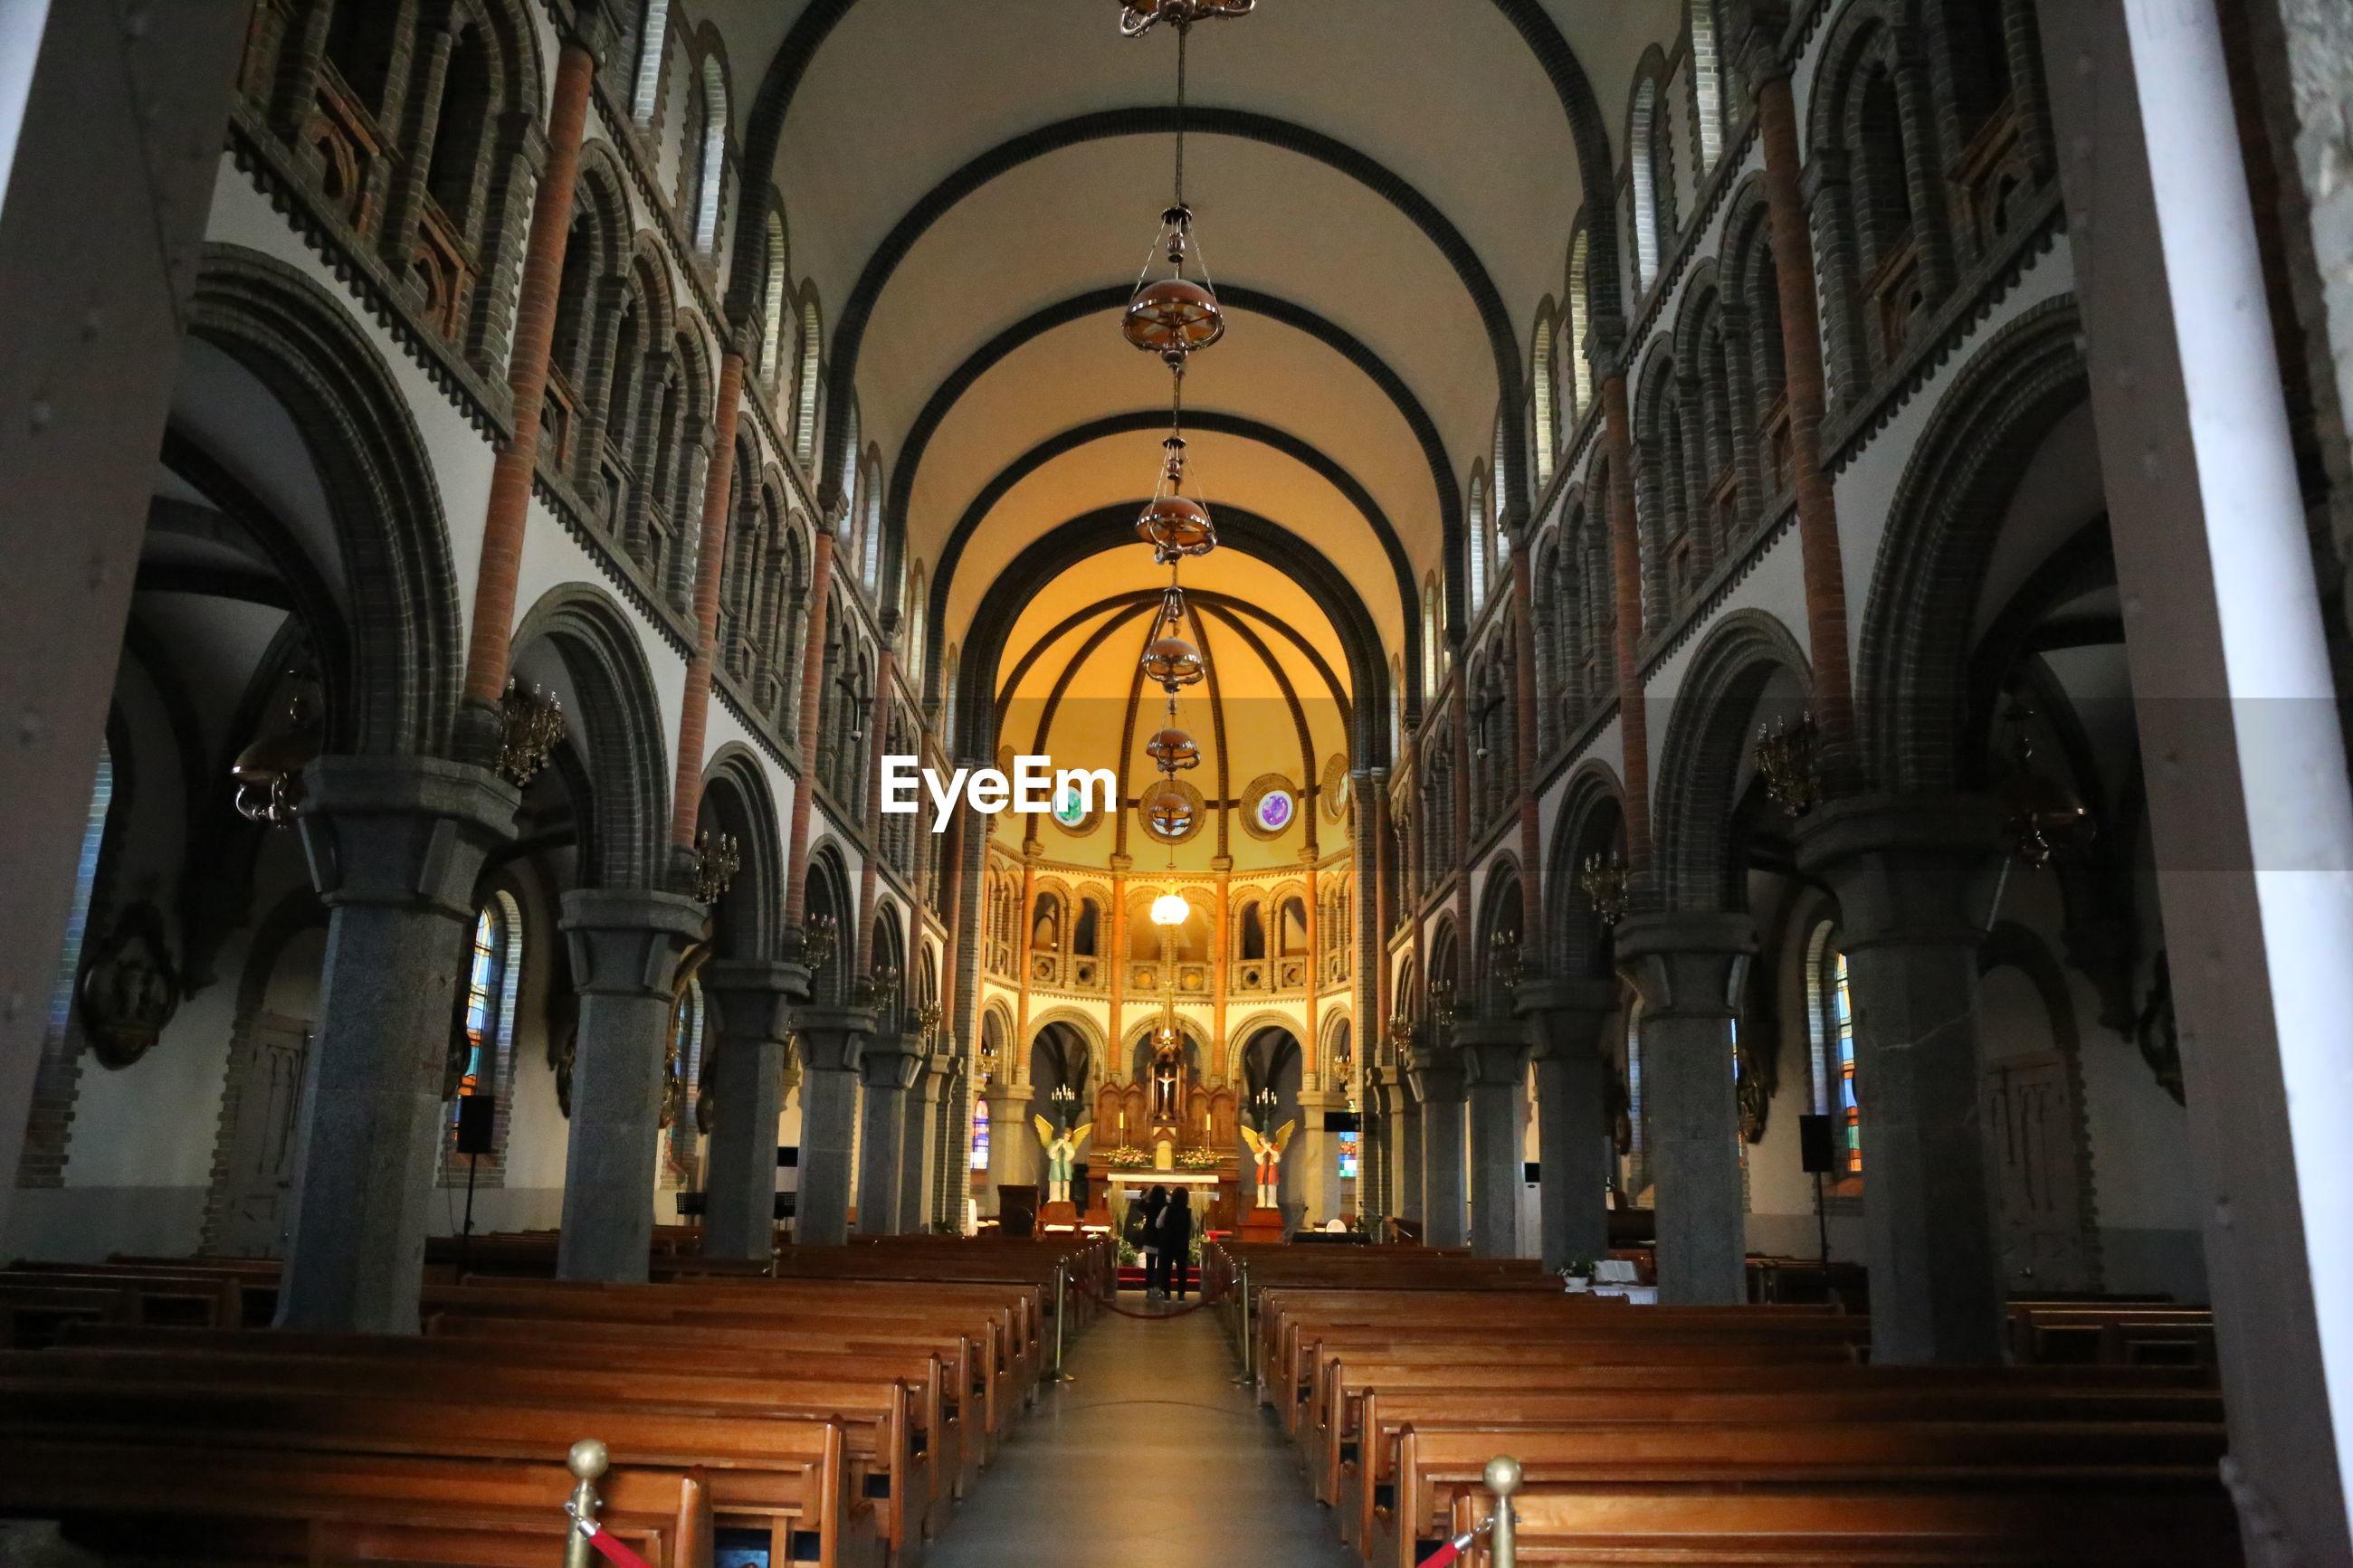 Pews in illuminated church